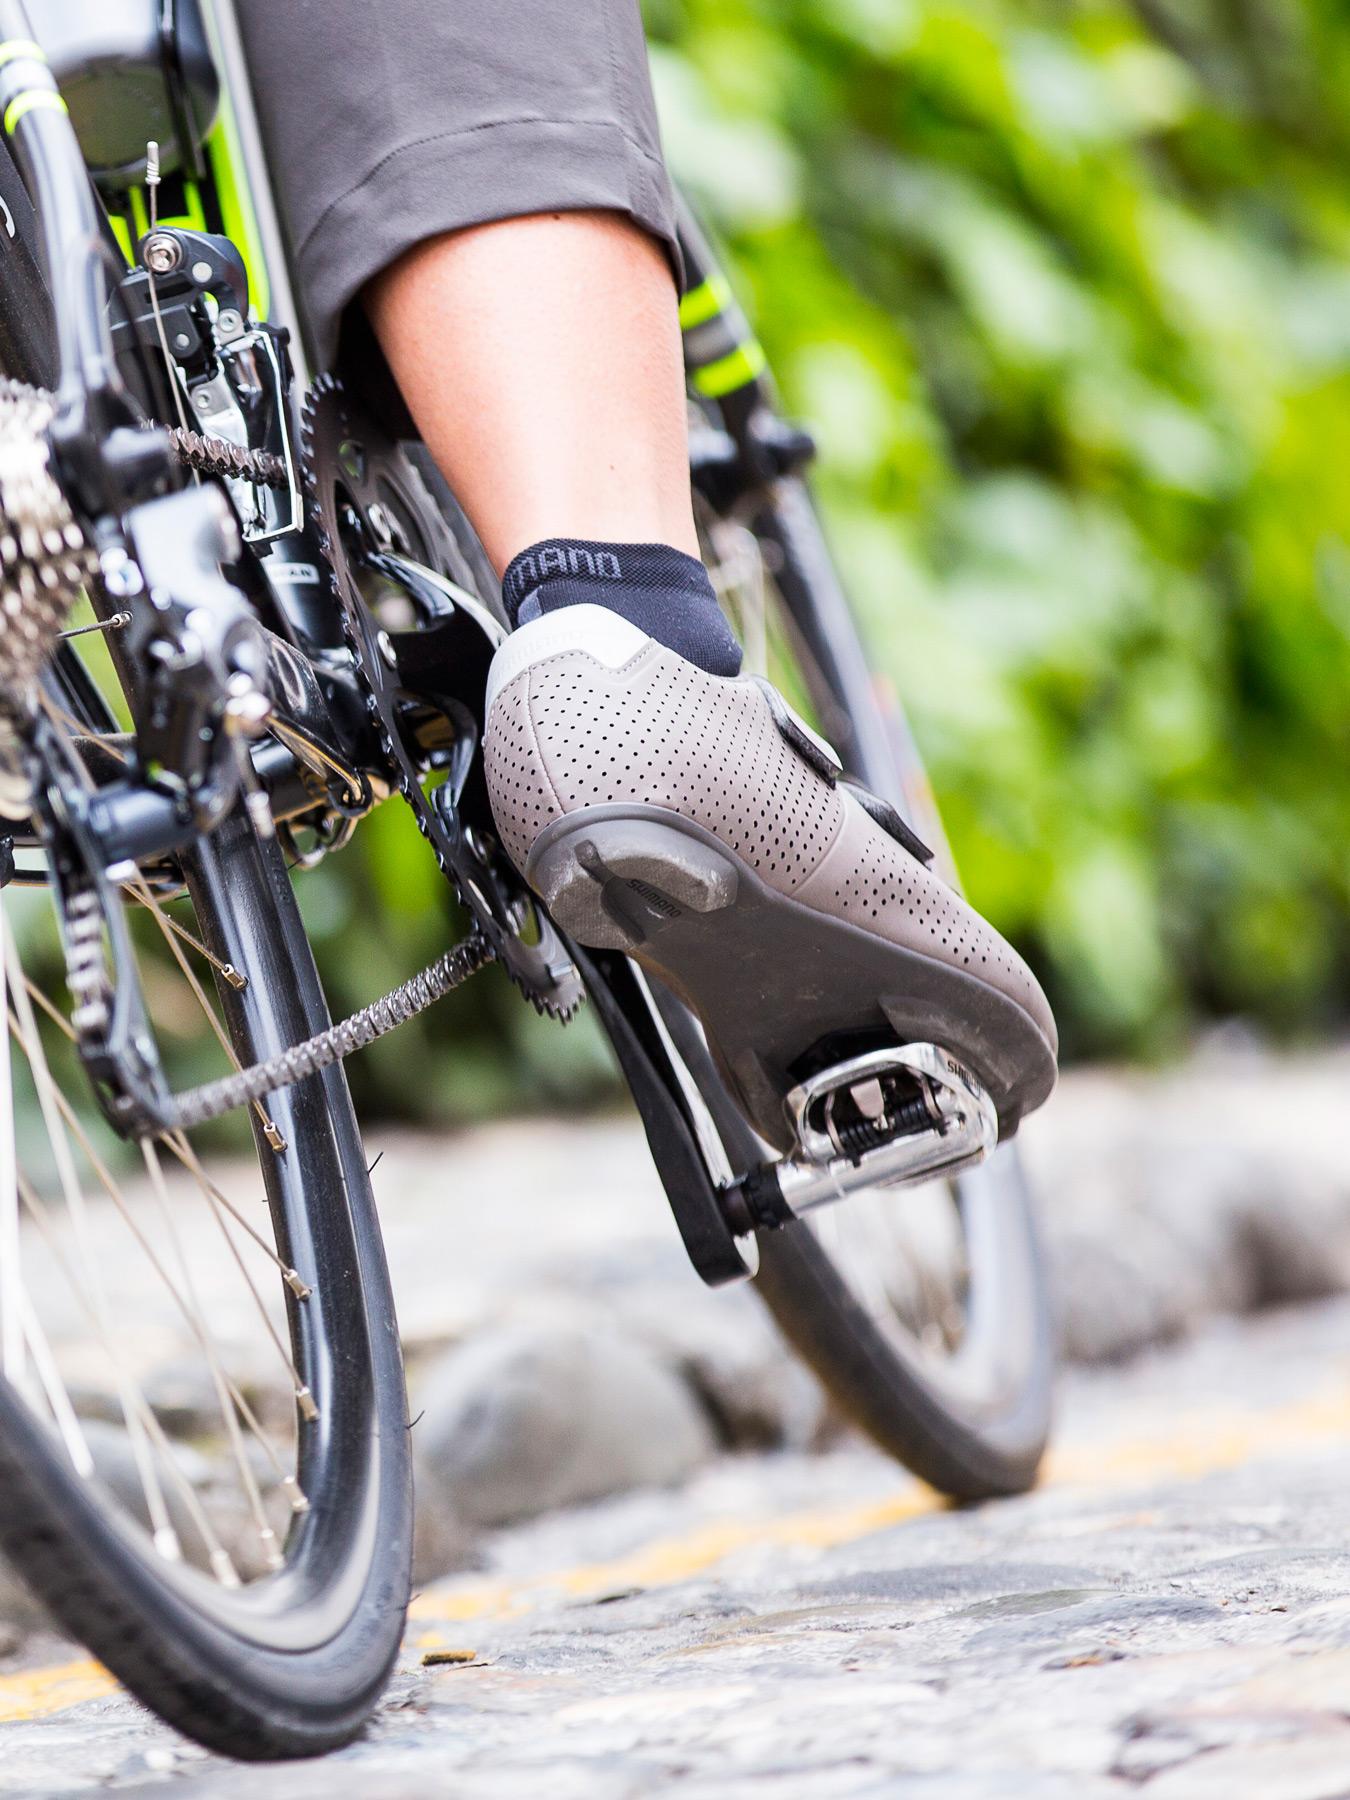 Shimano Explorer-Transit clothing-urban-touring-riding-gear RT5-shoes-riding  ... f945015fb